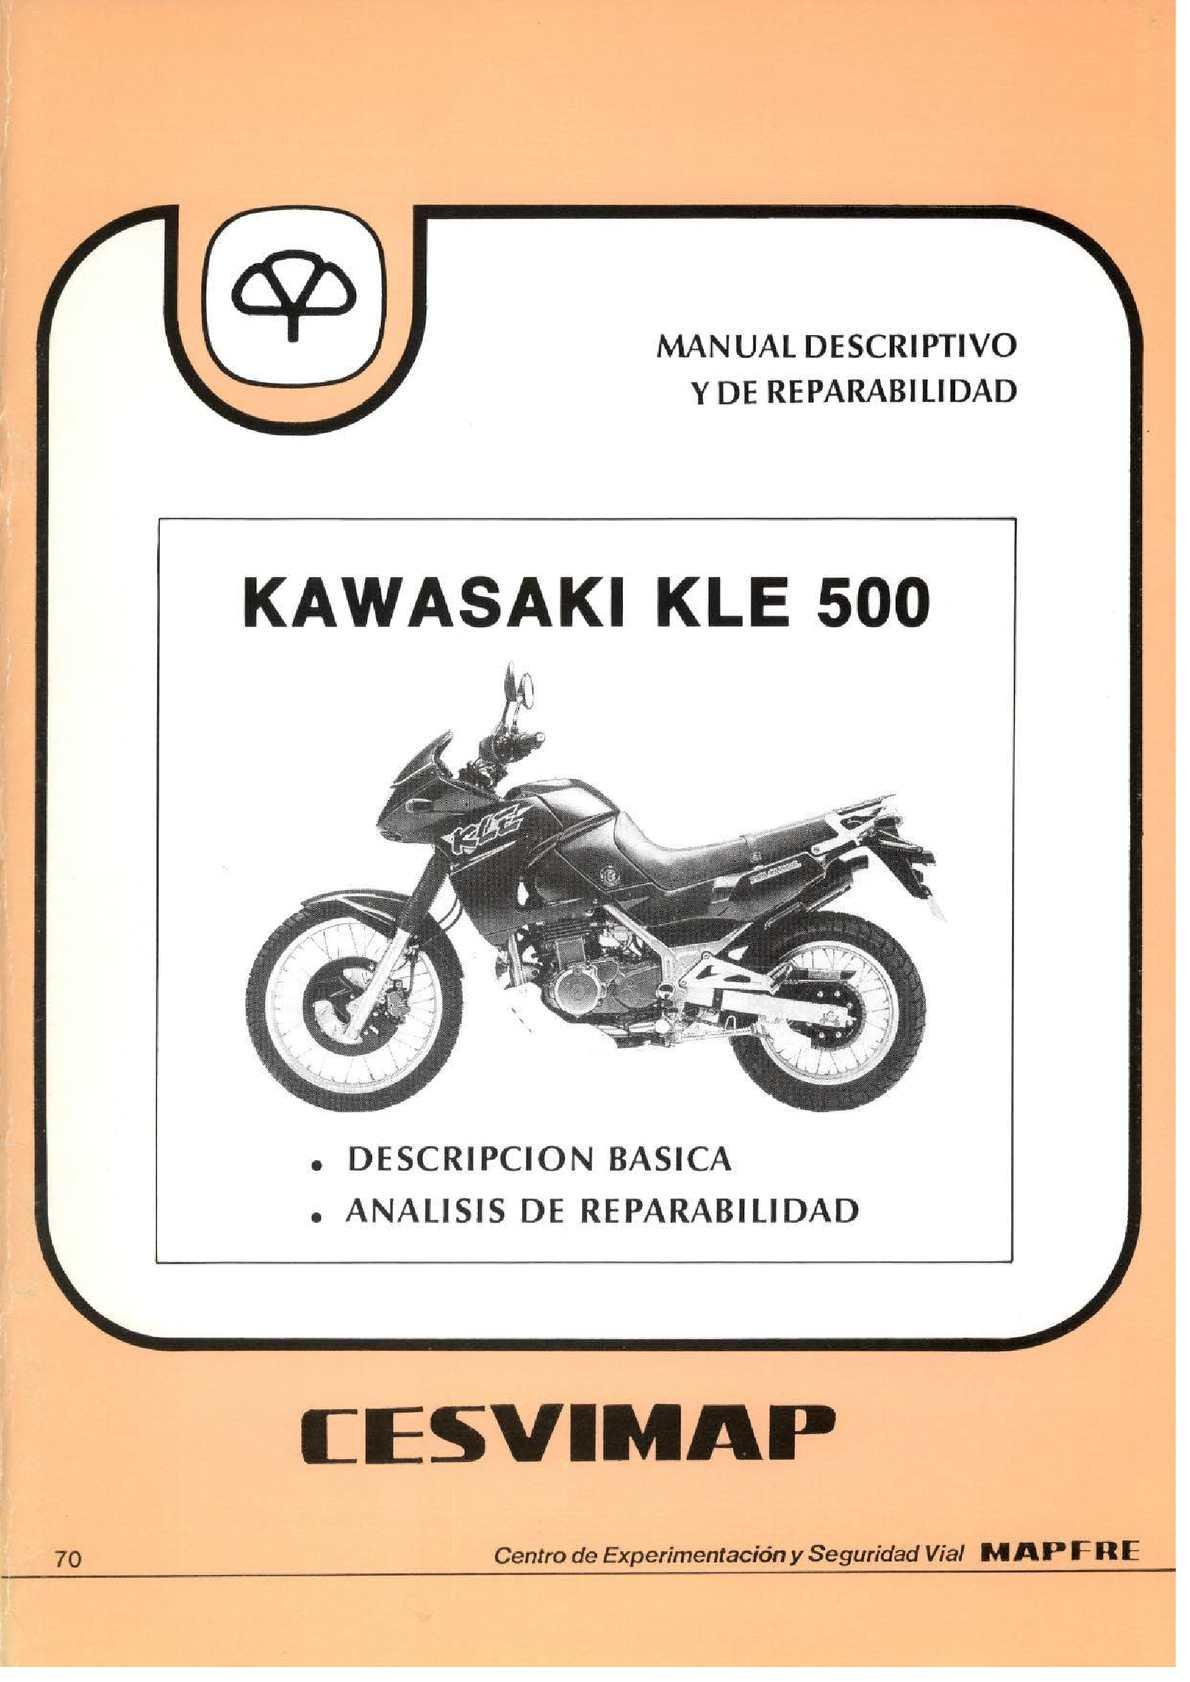 Manual Maphre KLE 500